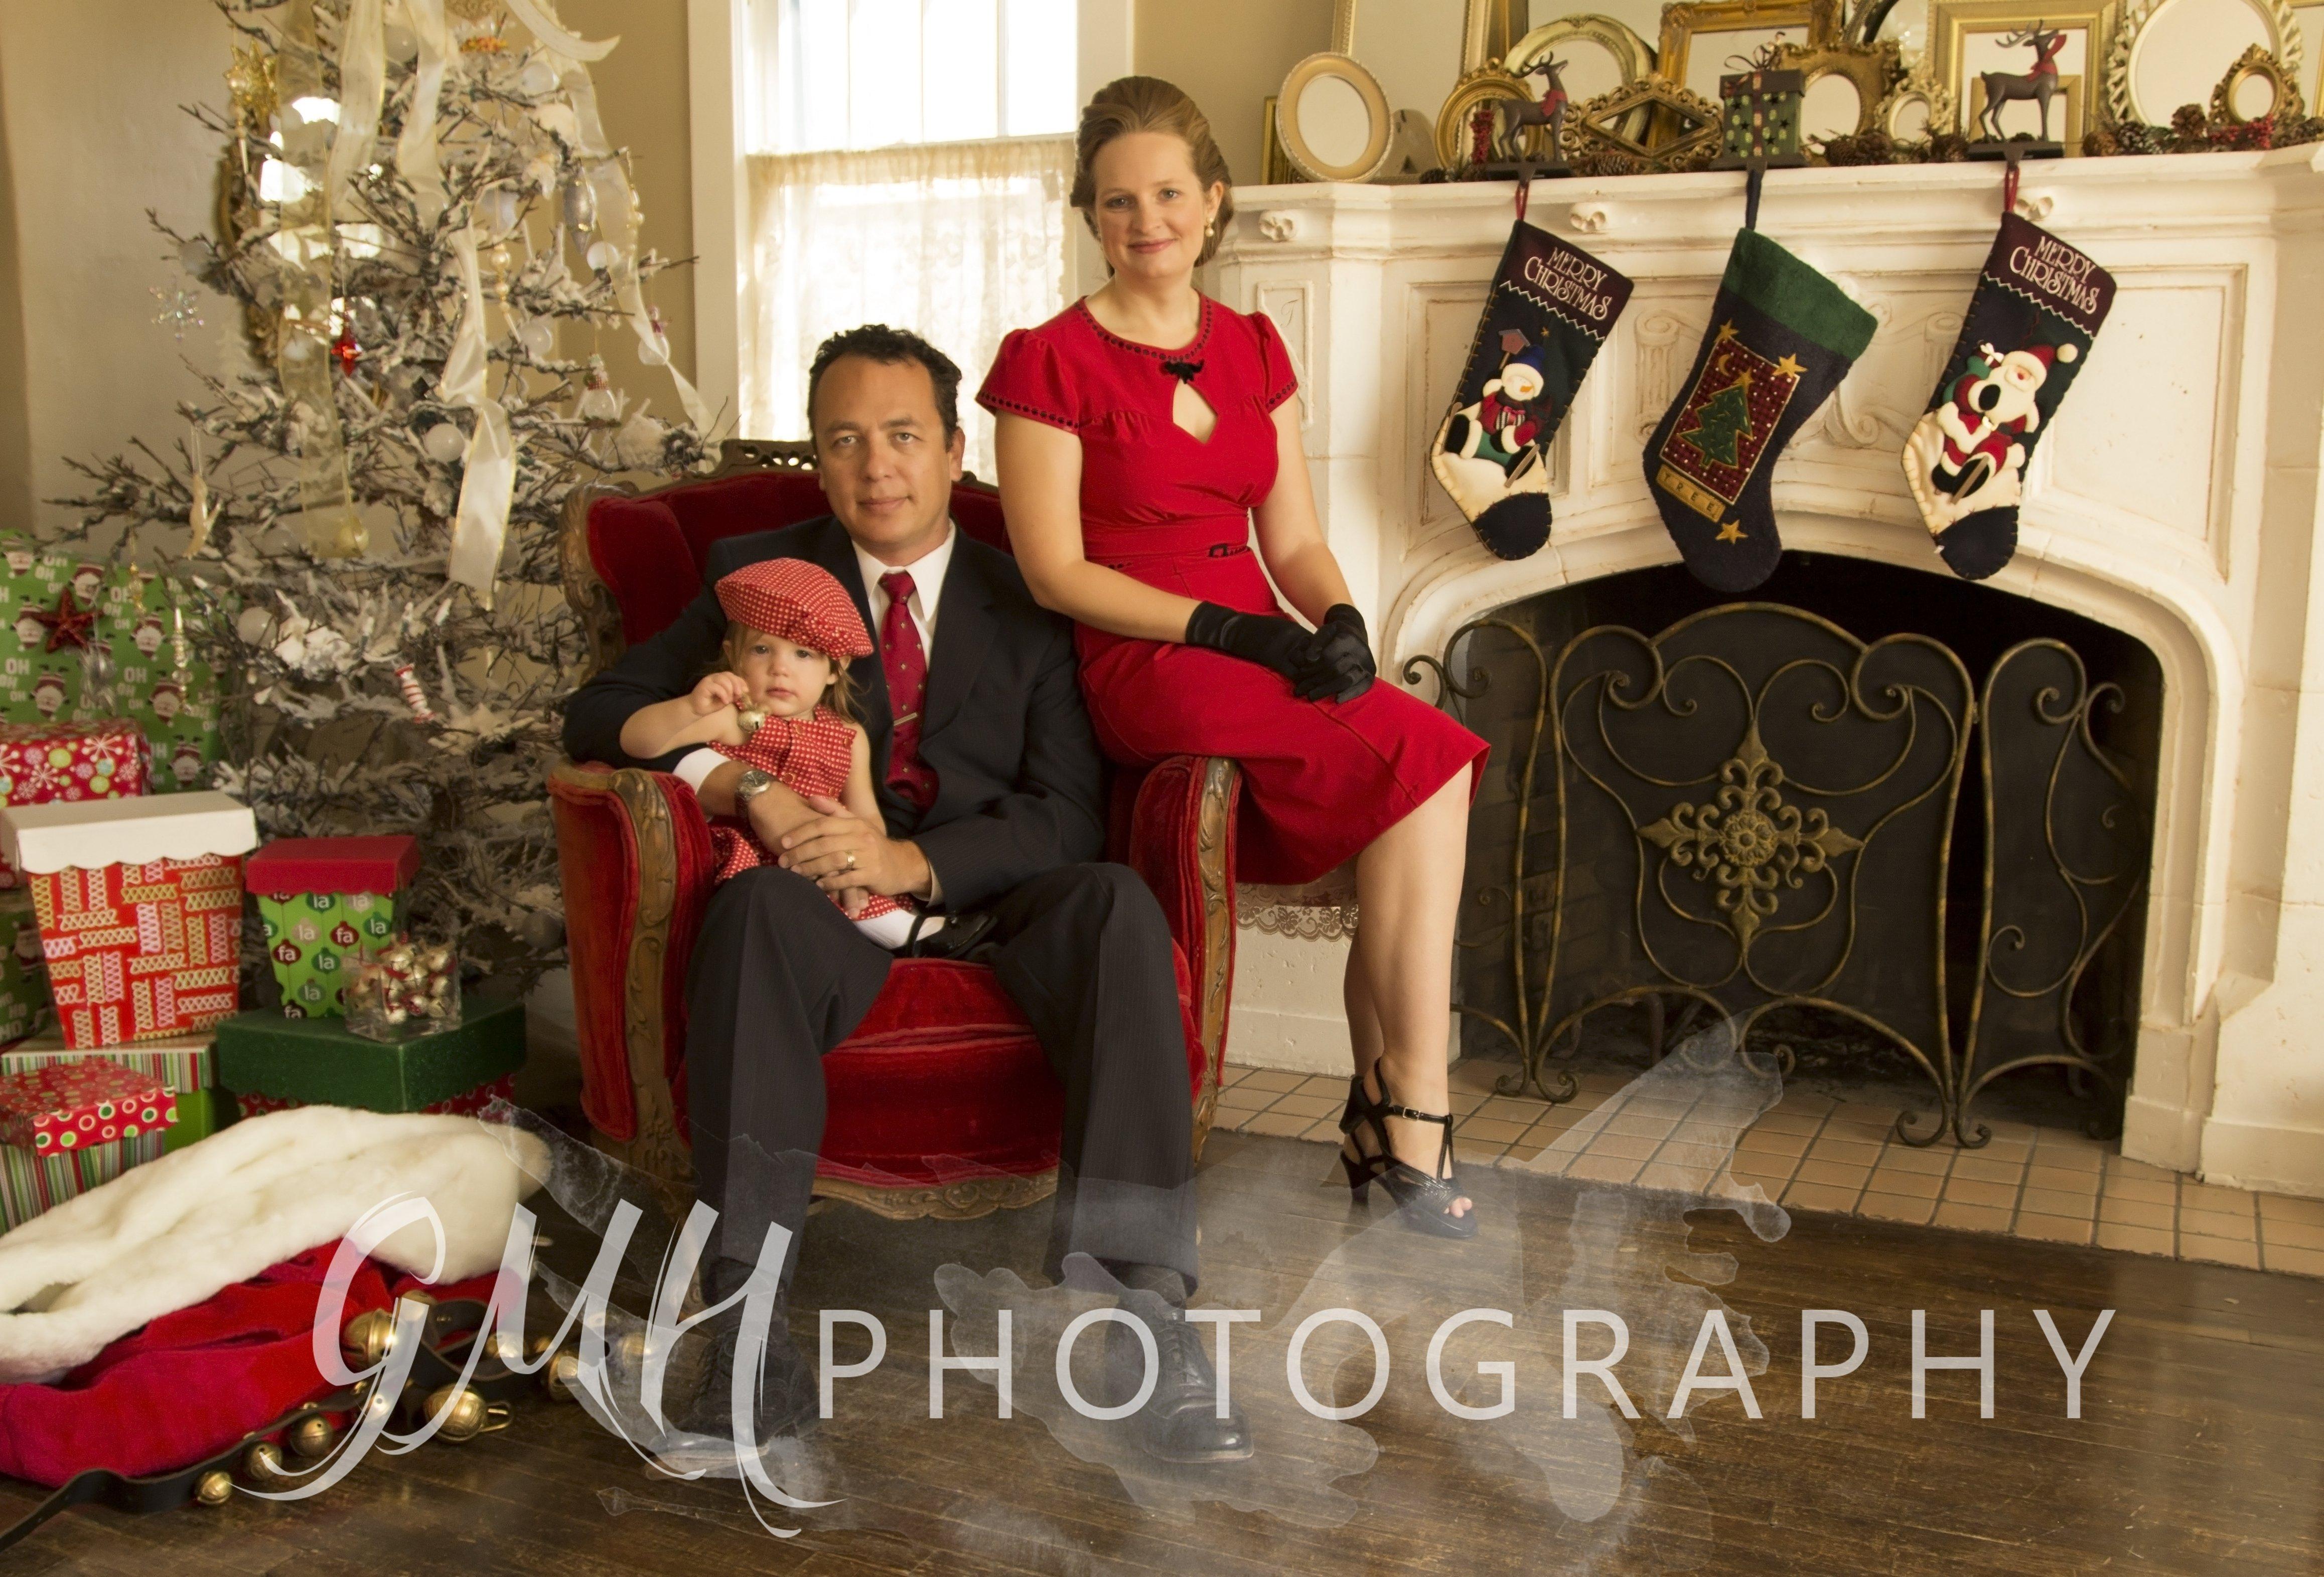 10 Fabulous Unique Family Christmas Photo Ideas unique formal family photo shoot ideas compilation photo and